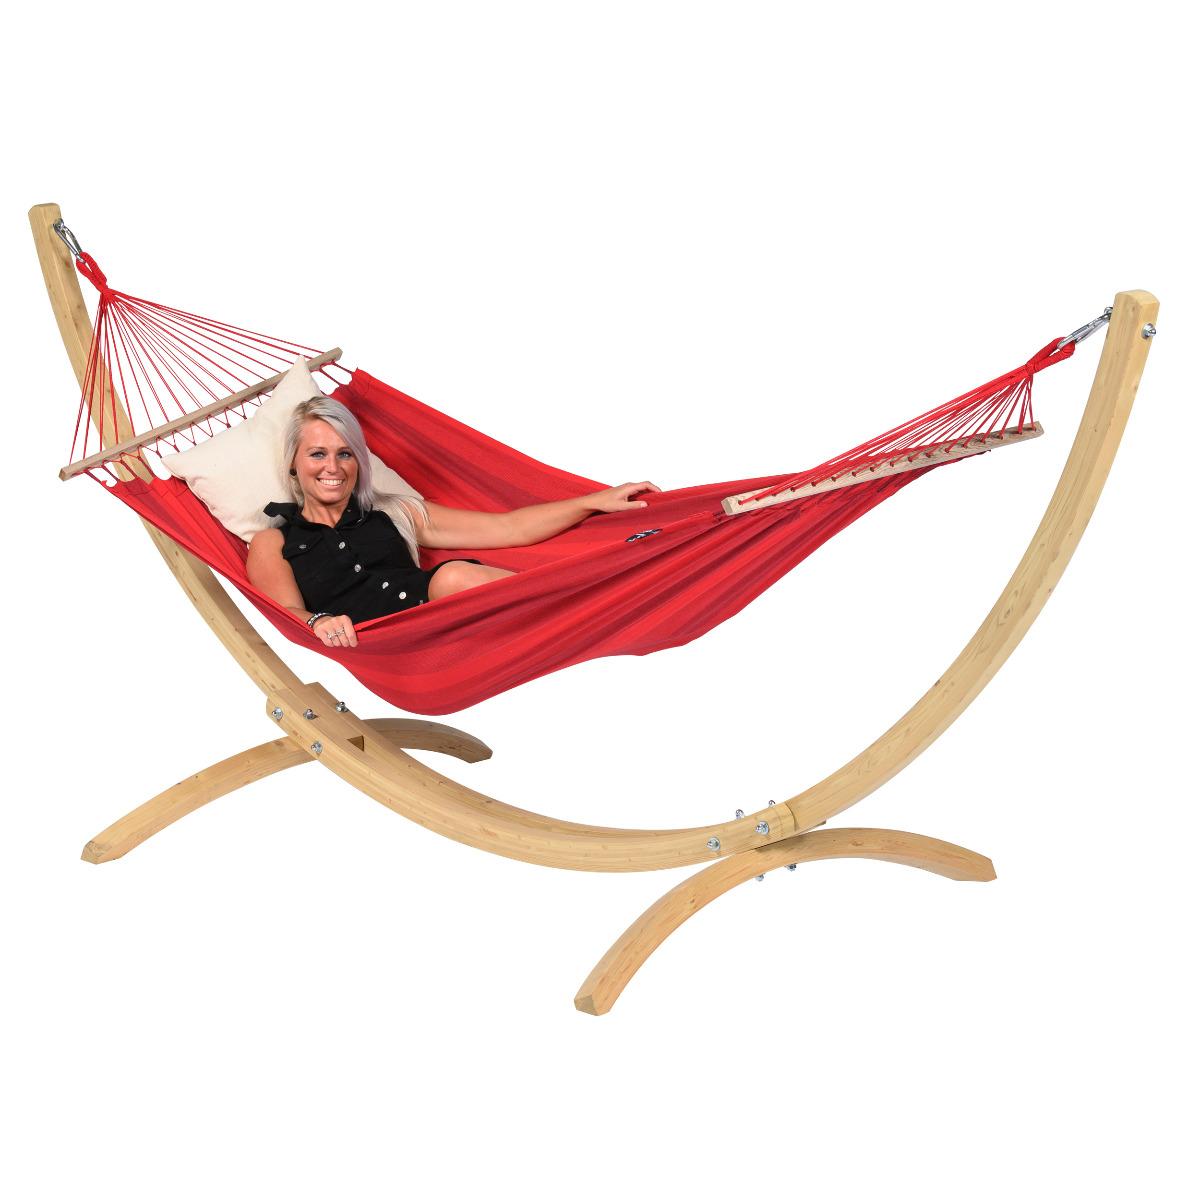 Hangmat met Standaard E�npersoons 'Wood & Relax' Red - Rood - Tropilex �